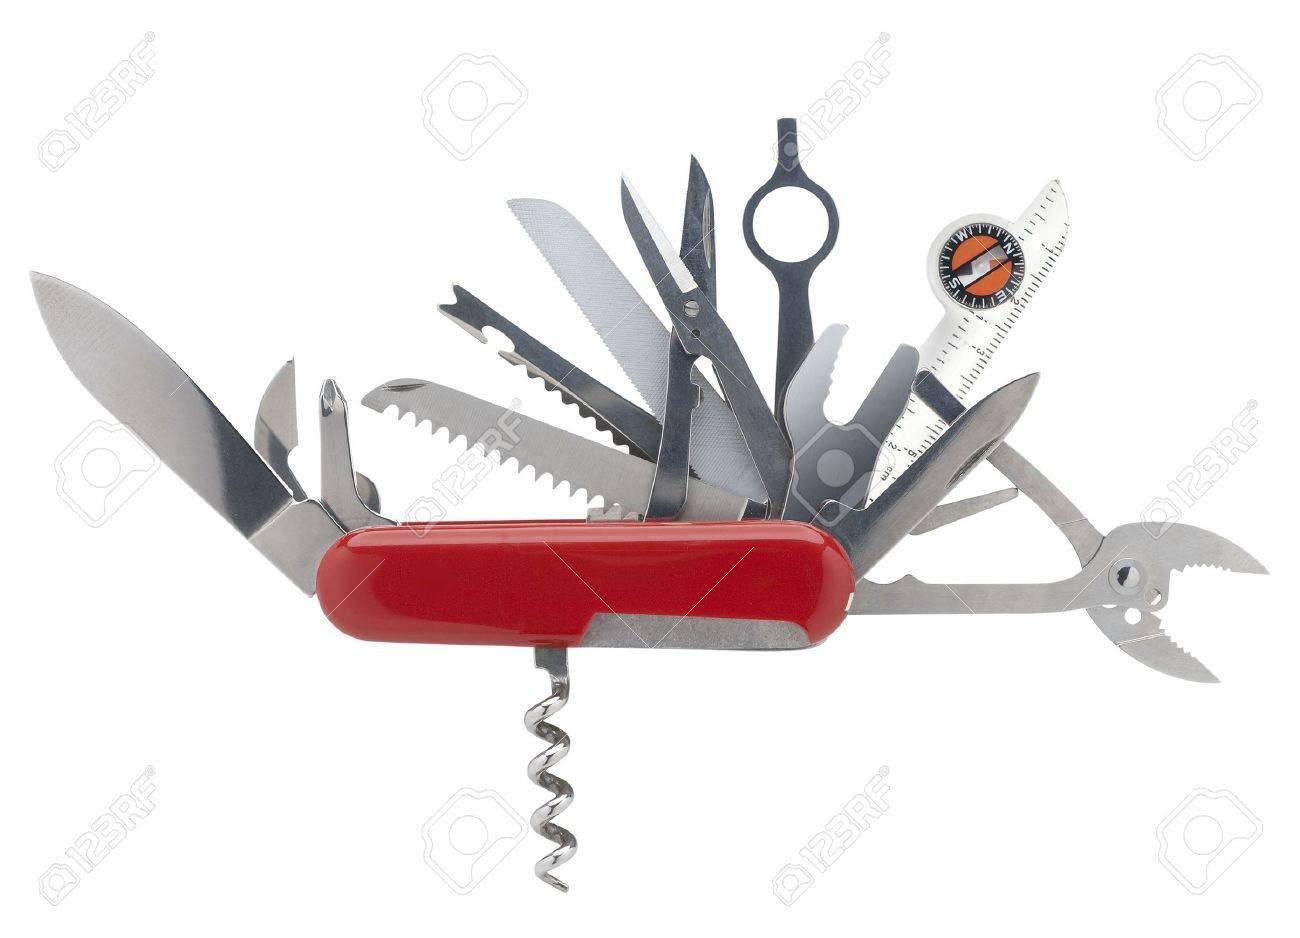 Utility knife - 5431707